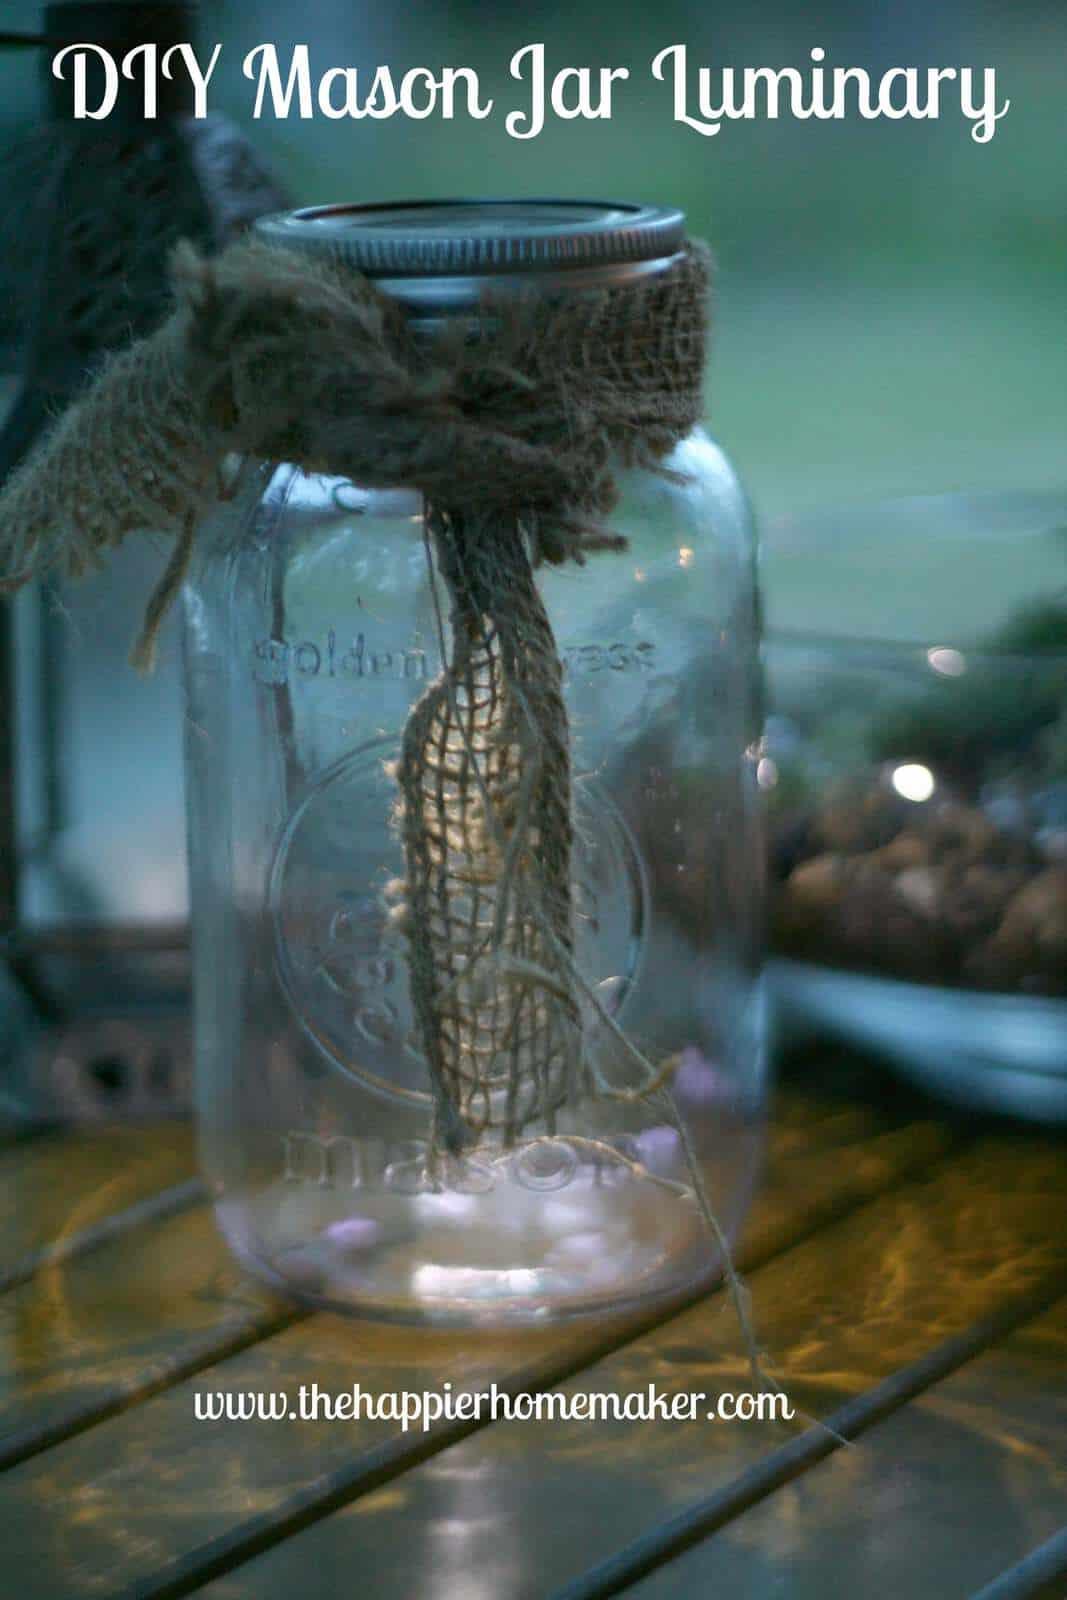 A DIY glass jar with luminary burlap ribbon